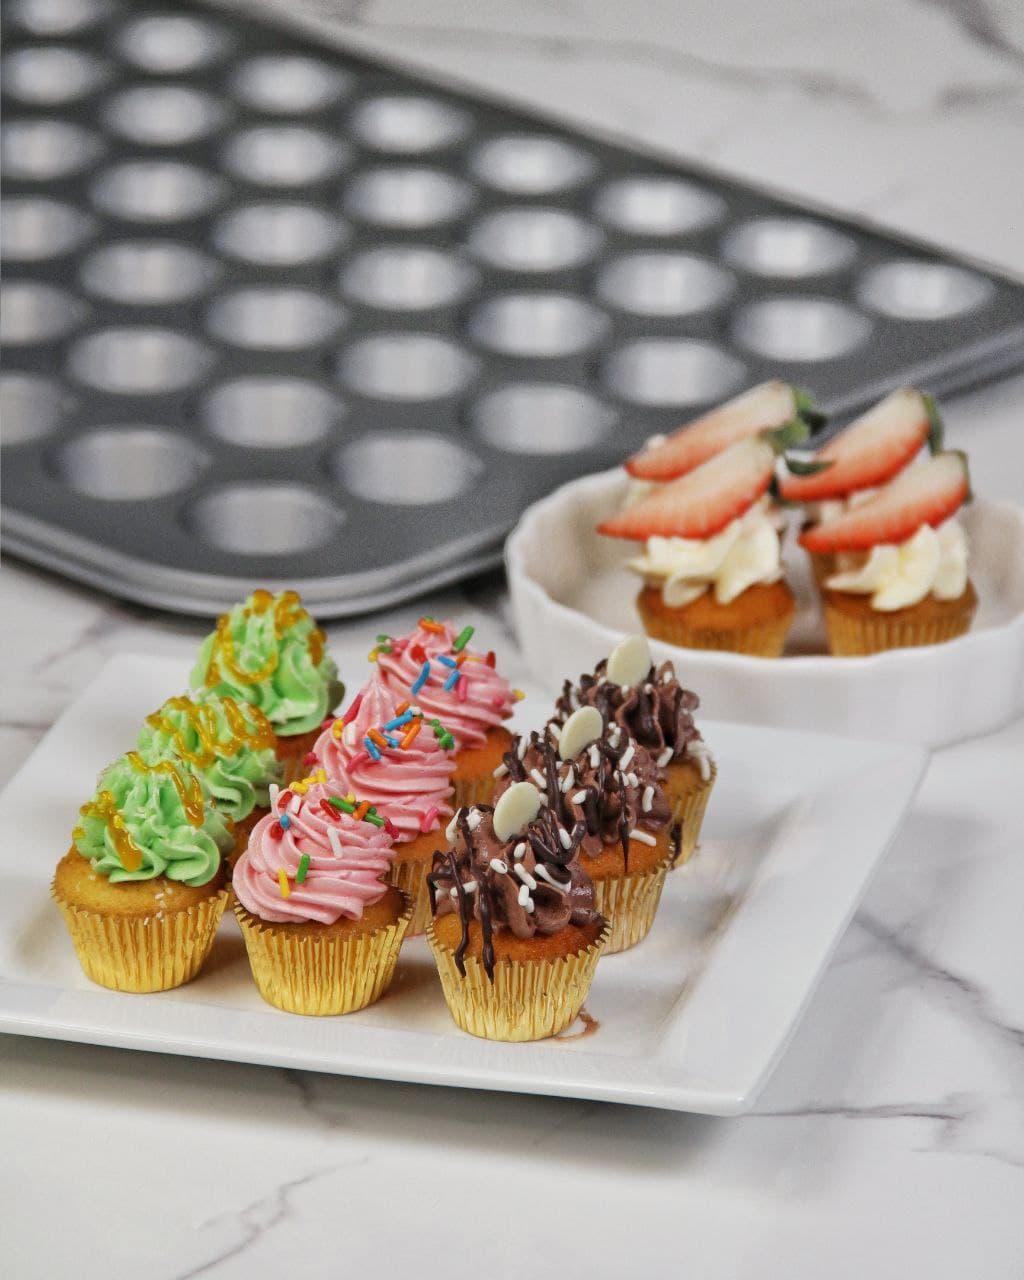 4 Flavors 1 Mini Cupcake Recipe with Städter Baking Pan